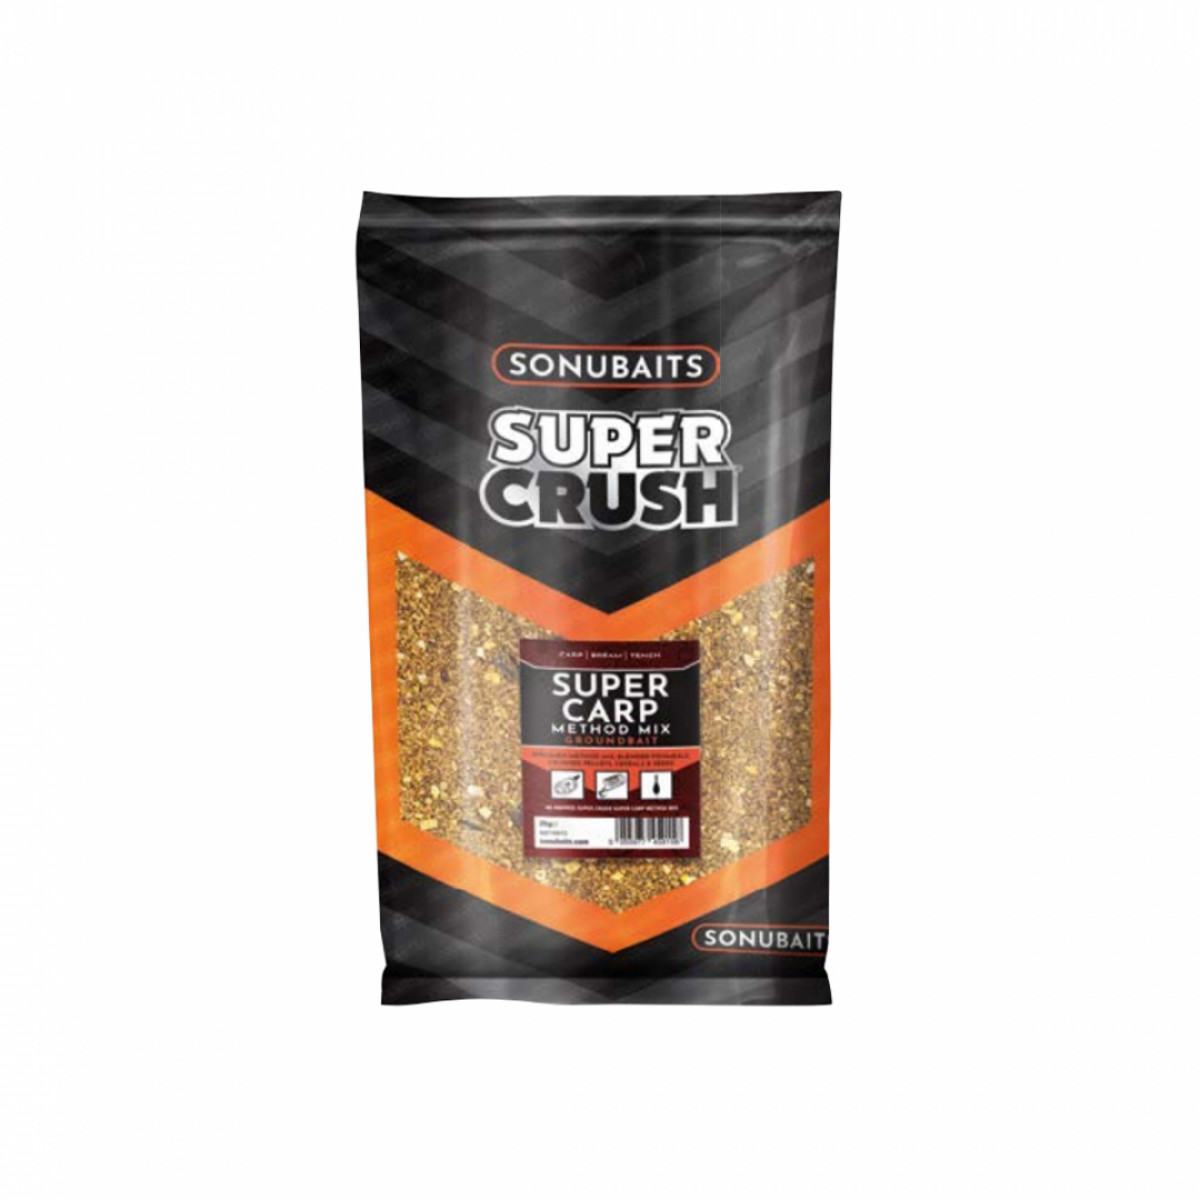 Super Carp Method Mix